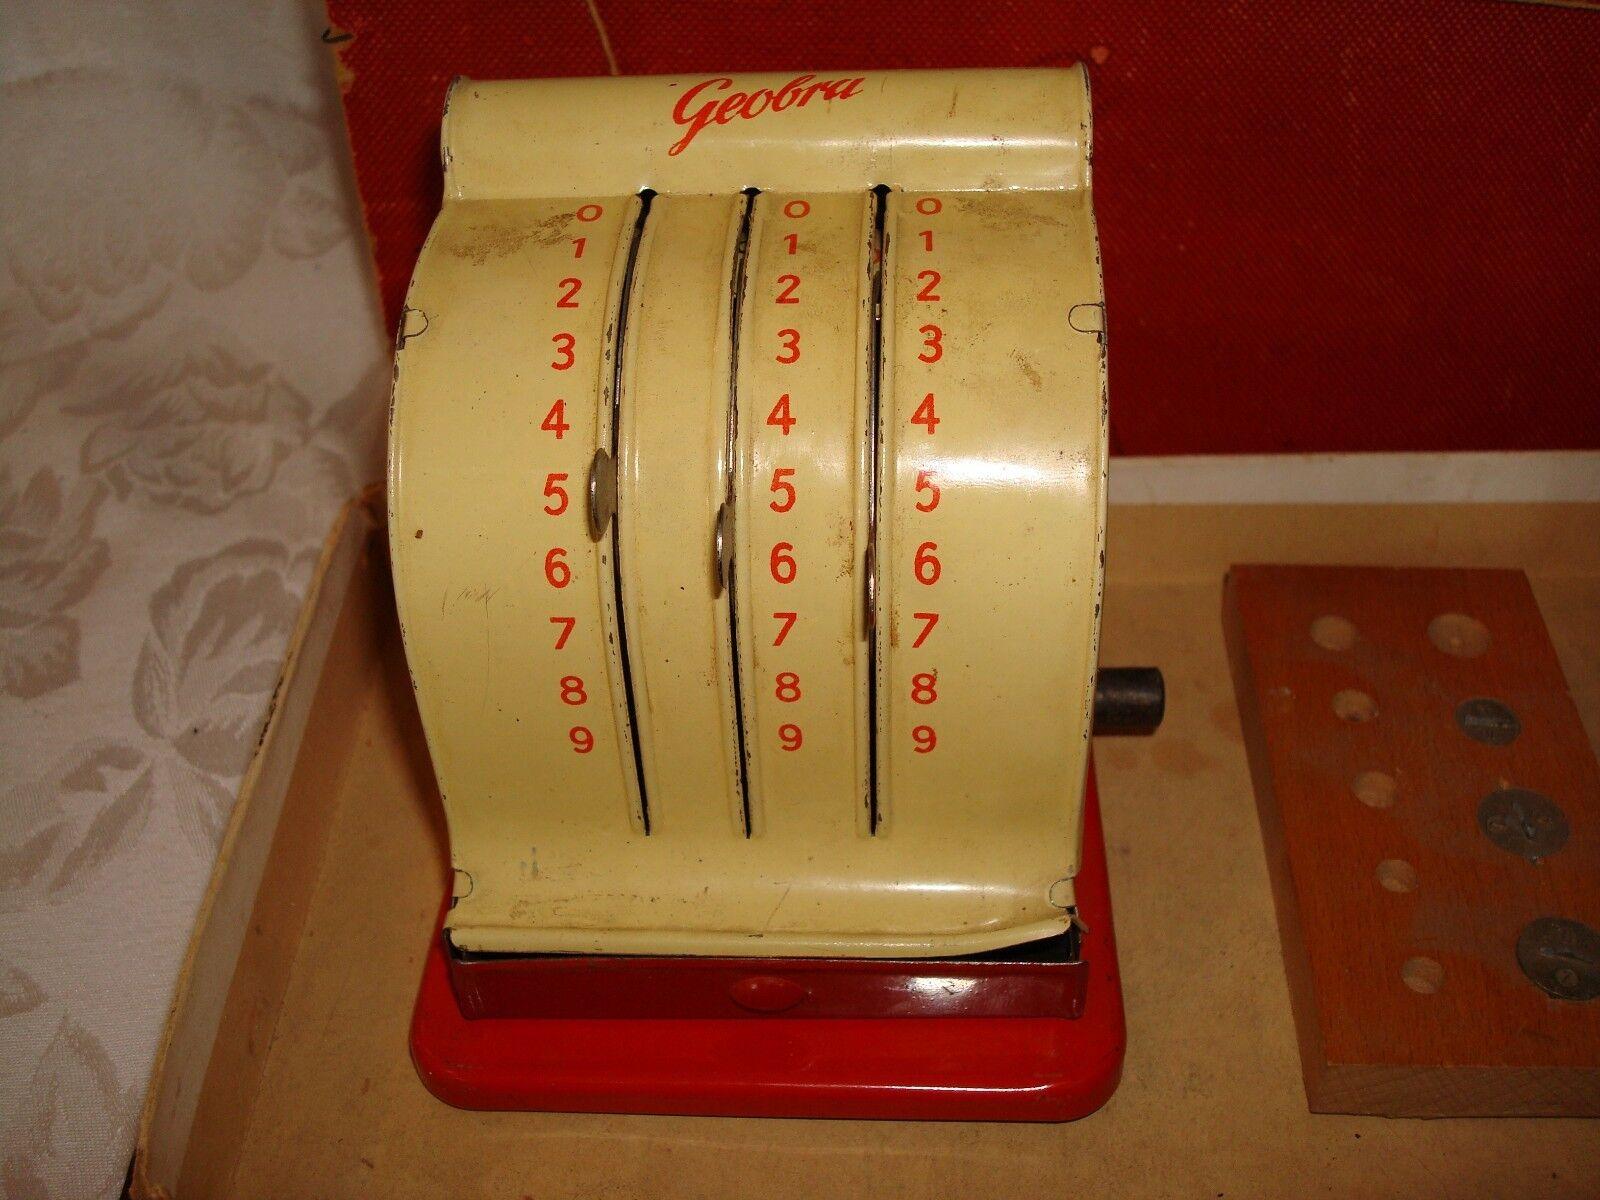 ANTIQUE EARLY PLAYMOBIL PLAYMOBIL PLAYMOBIL 1930's GEOBRA TIN TOY SHOP 4 PIECE SET ORIGINAL BOX RARE 45d9c9